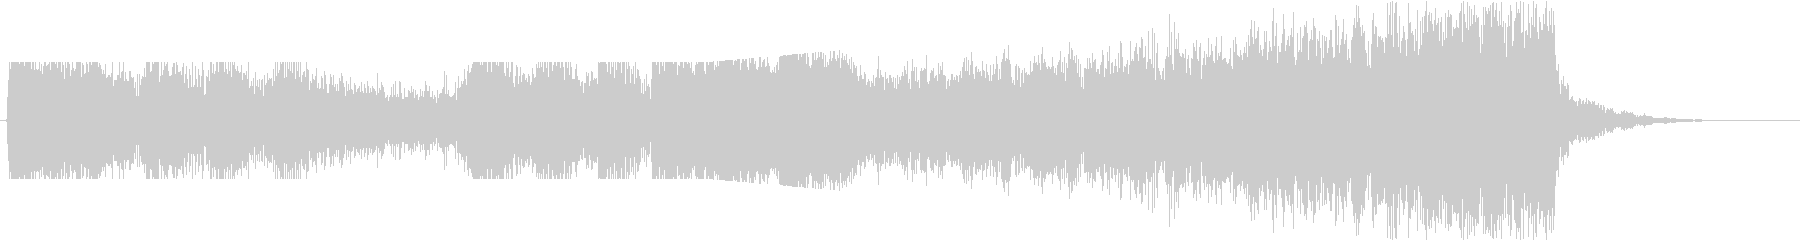 Sound logo, CM image of automobile company's unreproduced waveform